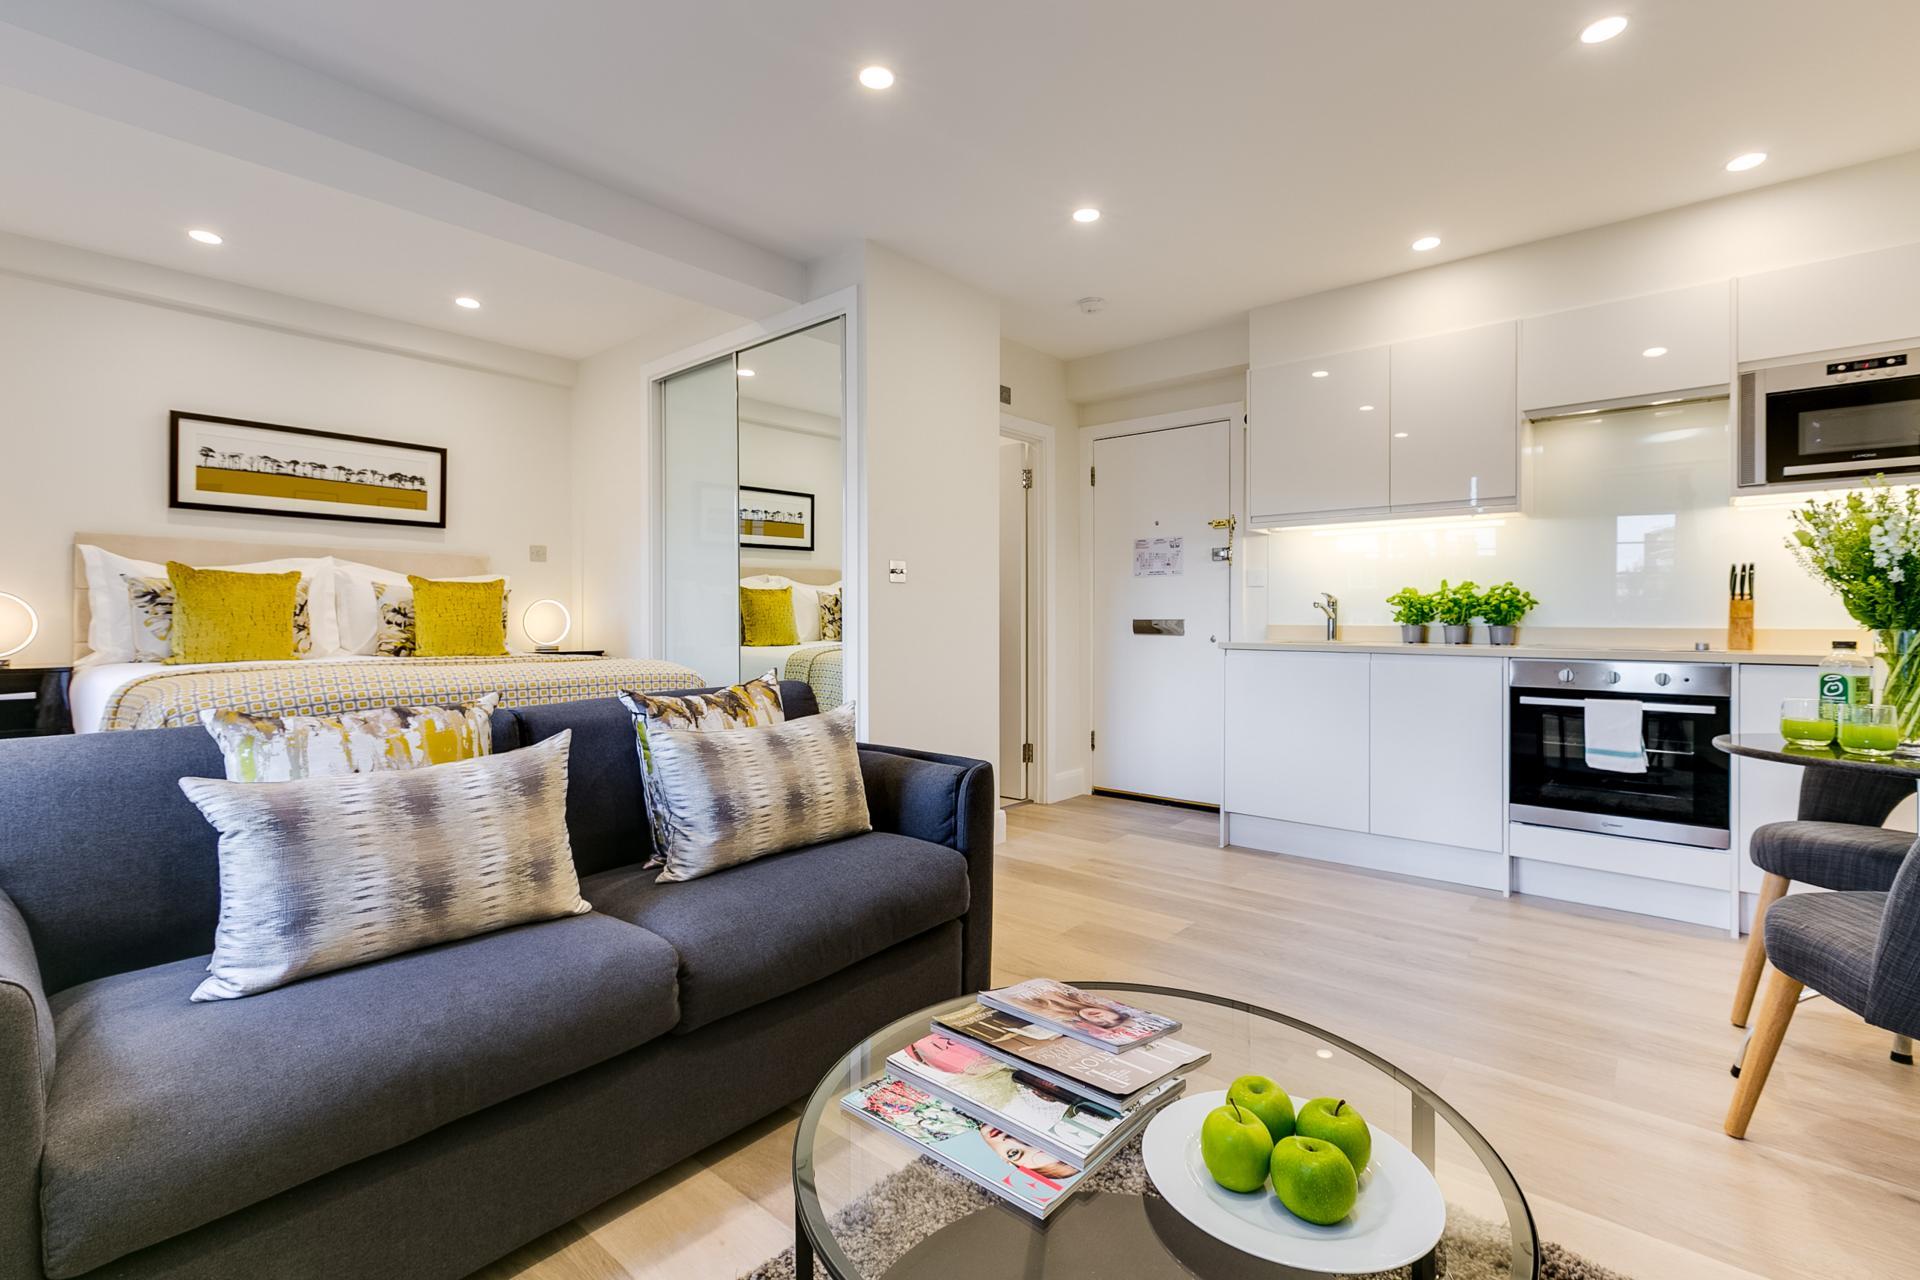 Sofa at Nell Gwynn Chelsea Accommodation, Chelsea, London - Citybase Apartments